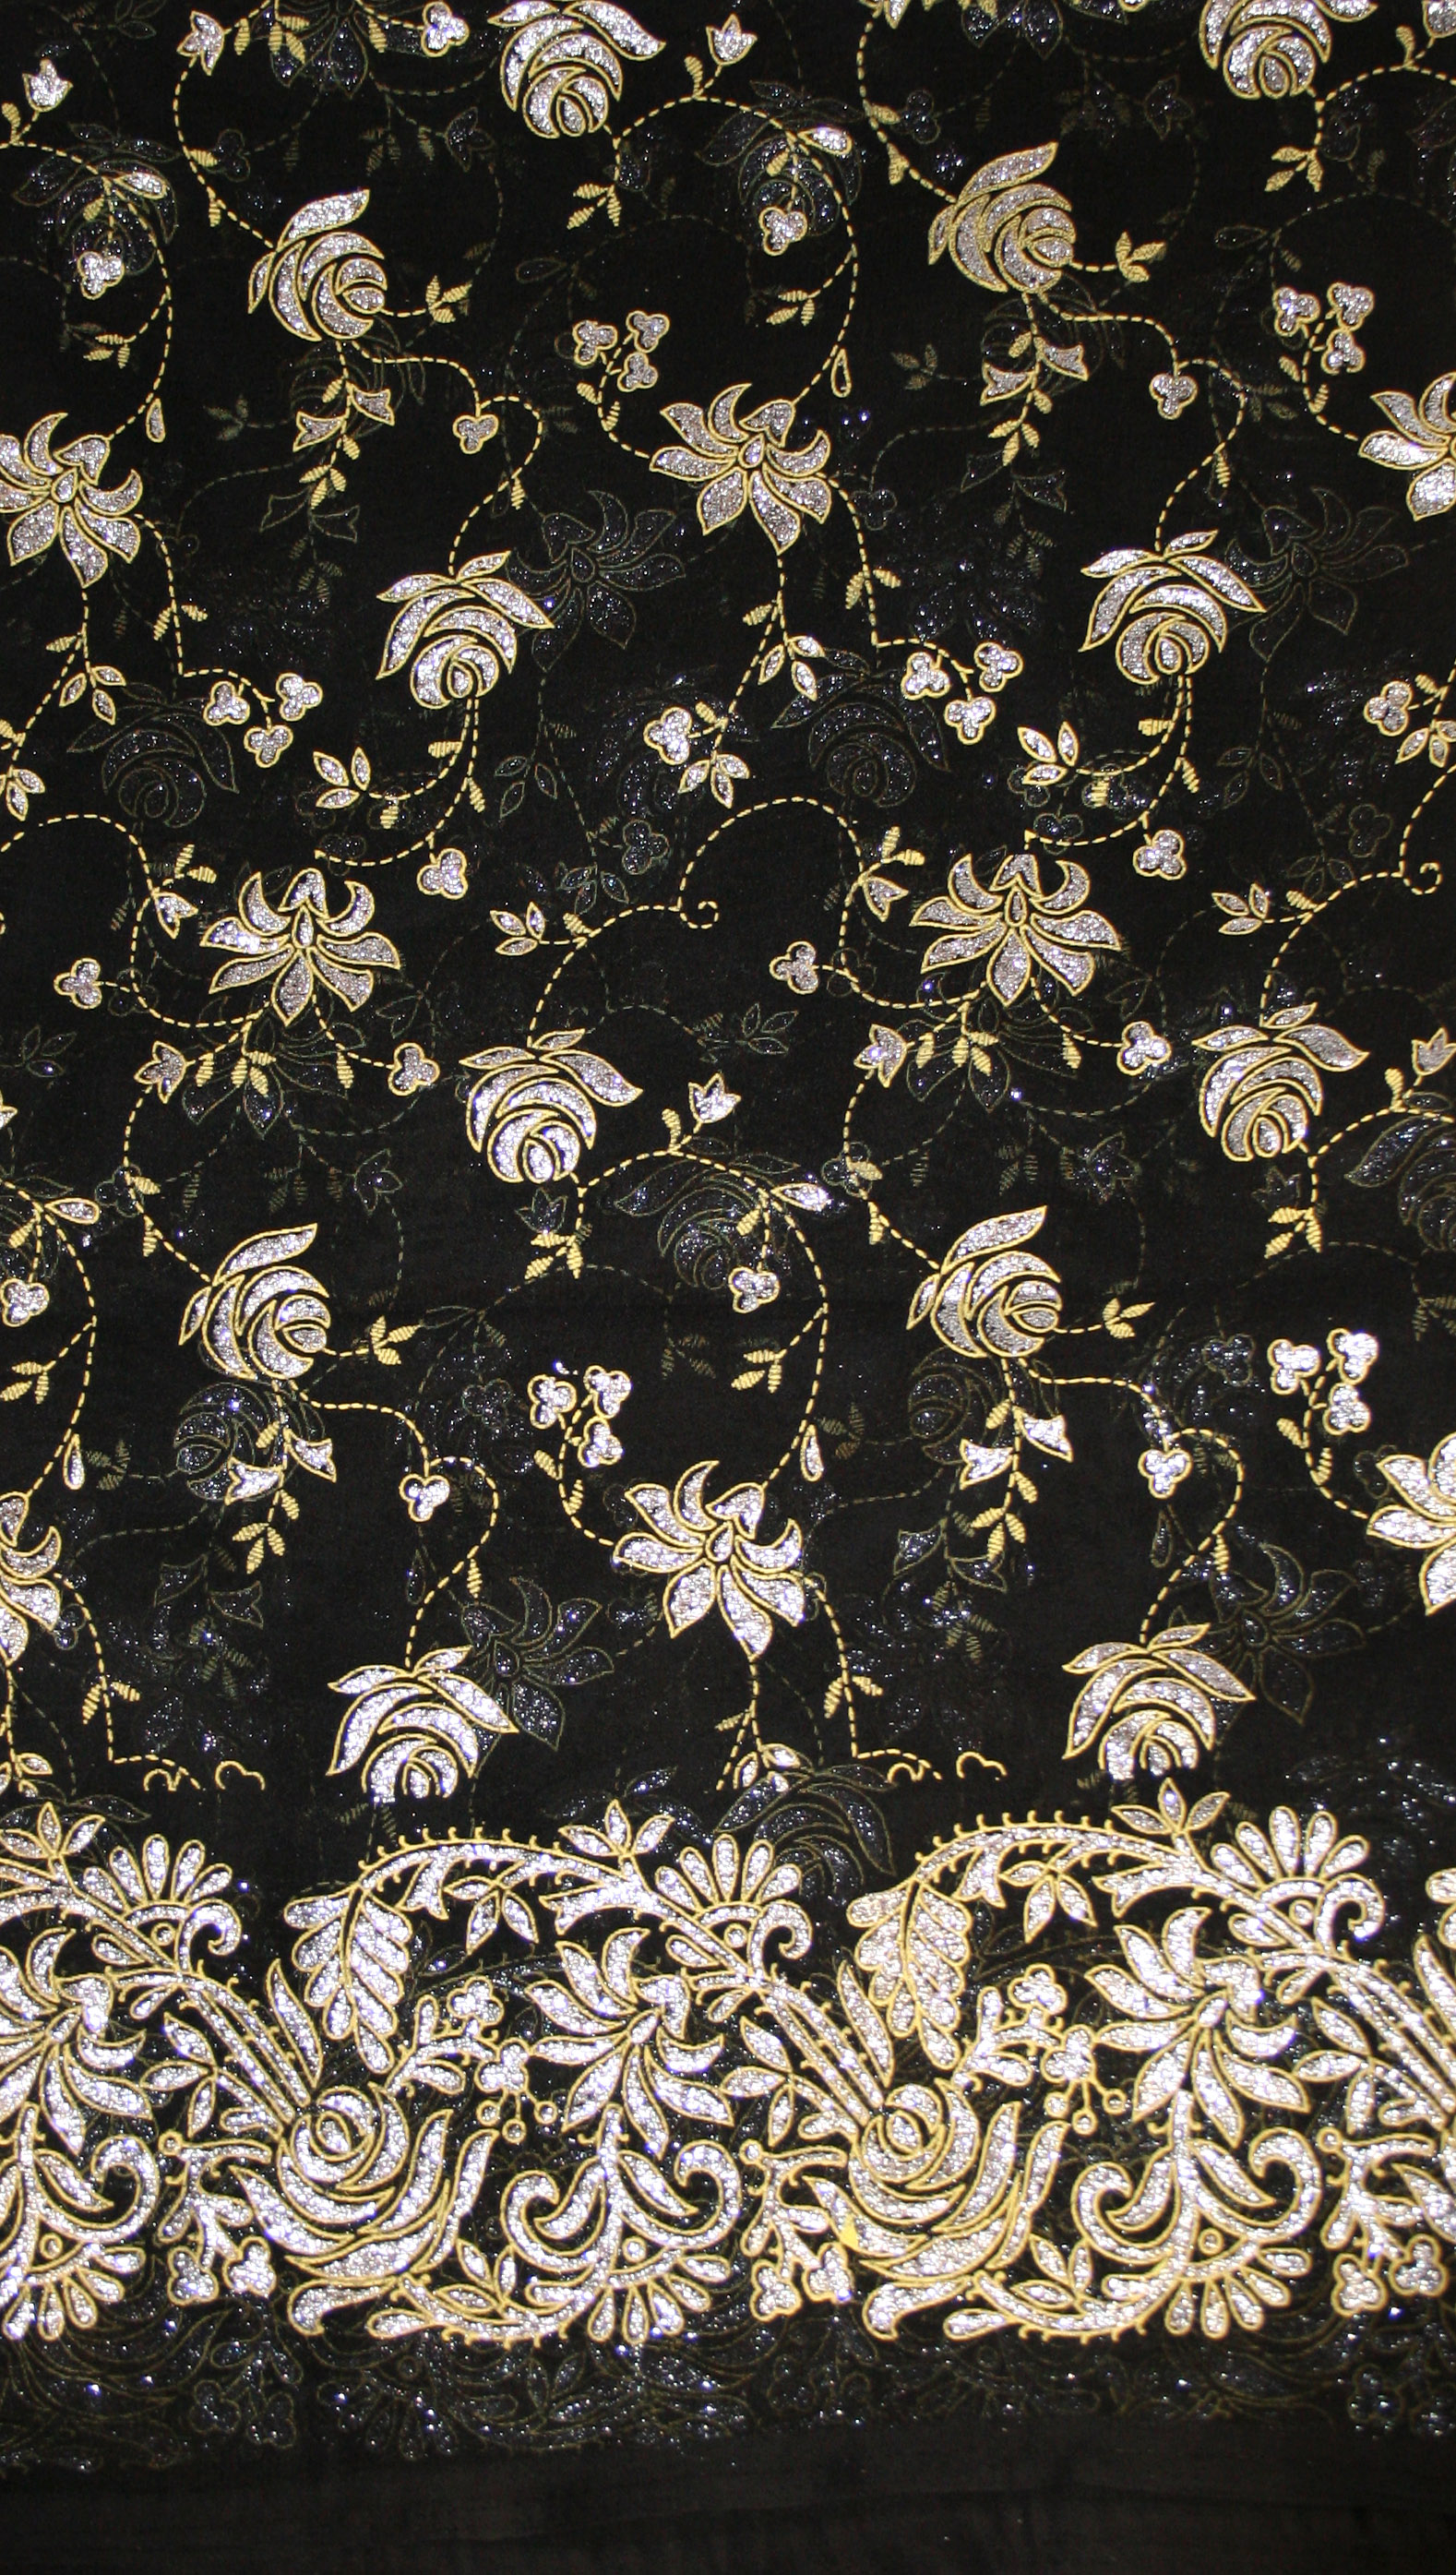 Sari Fabric 6 by Falln-Stock on DeviantArt